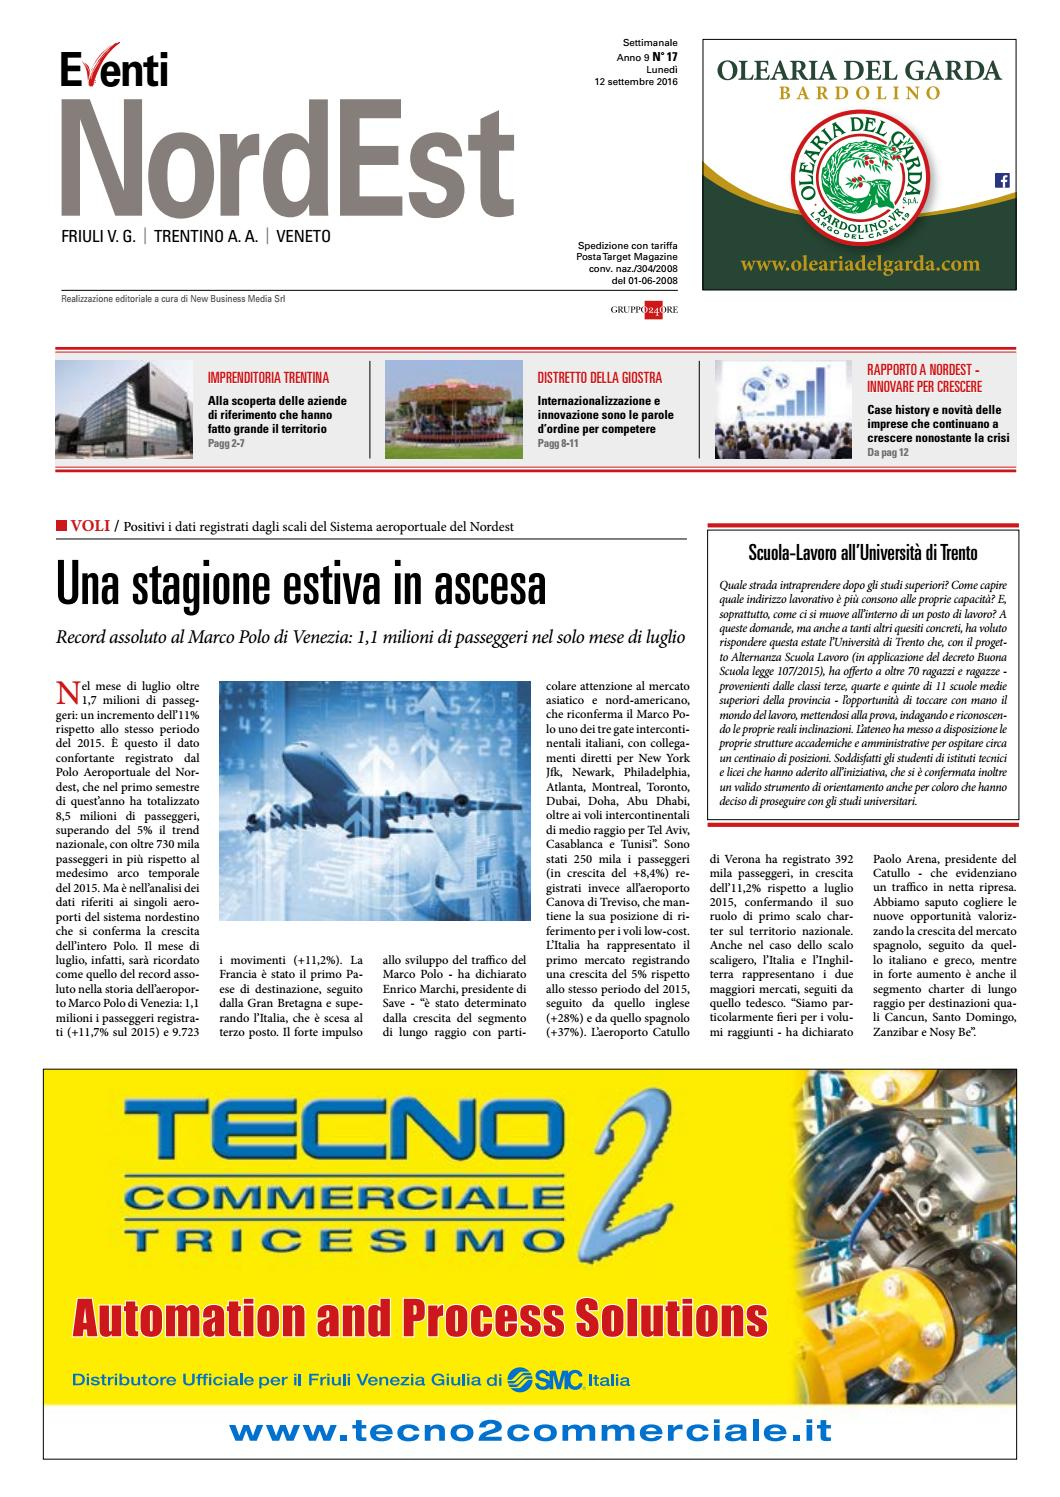 Eventi NordEst 17 2016 - Intervista a Mauro Gottardi di ACS Trento by ACS  Data Systems - issuu 4ae10b415512